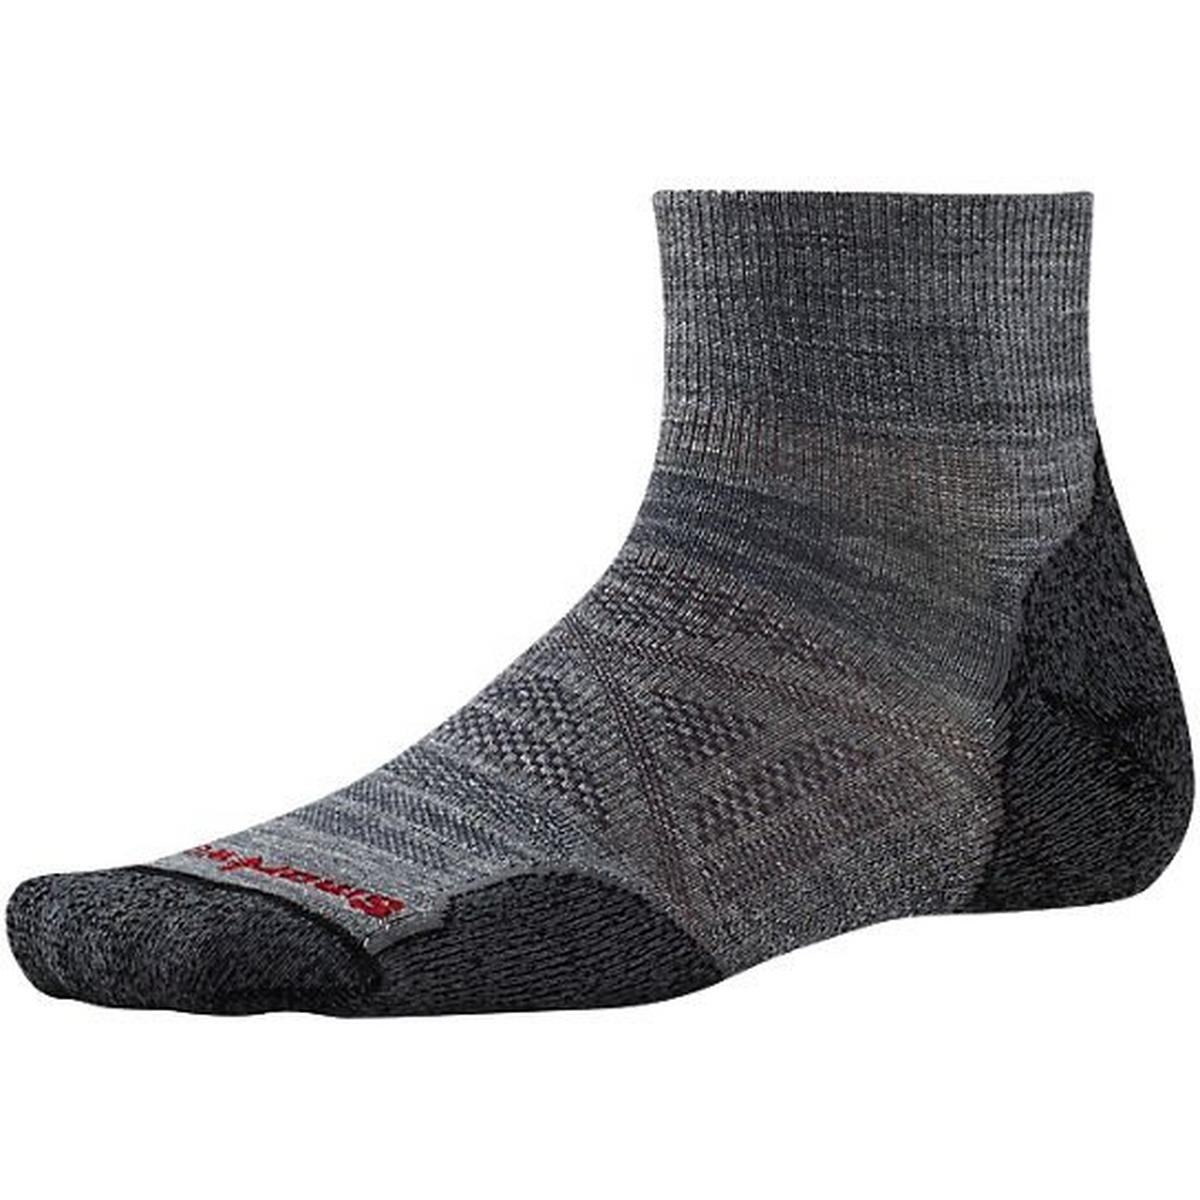 Smartwool HIKING Socks Men's PhD OD Light Mini Medium Grey